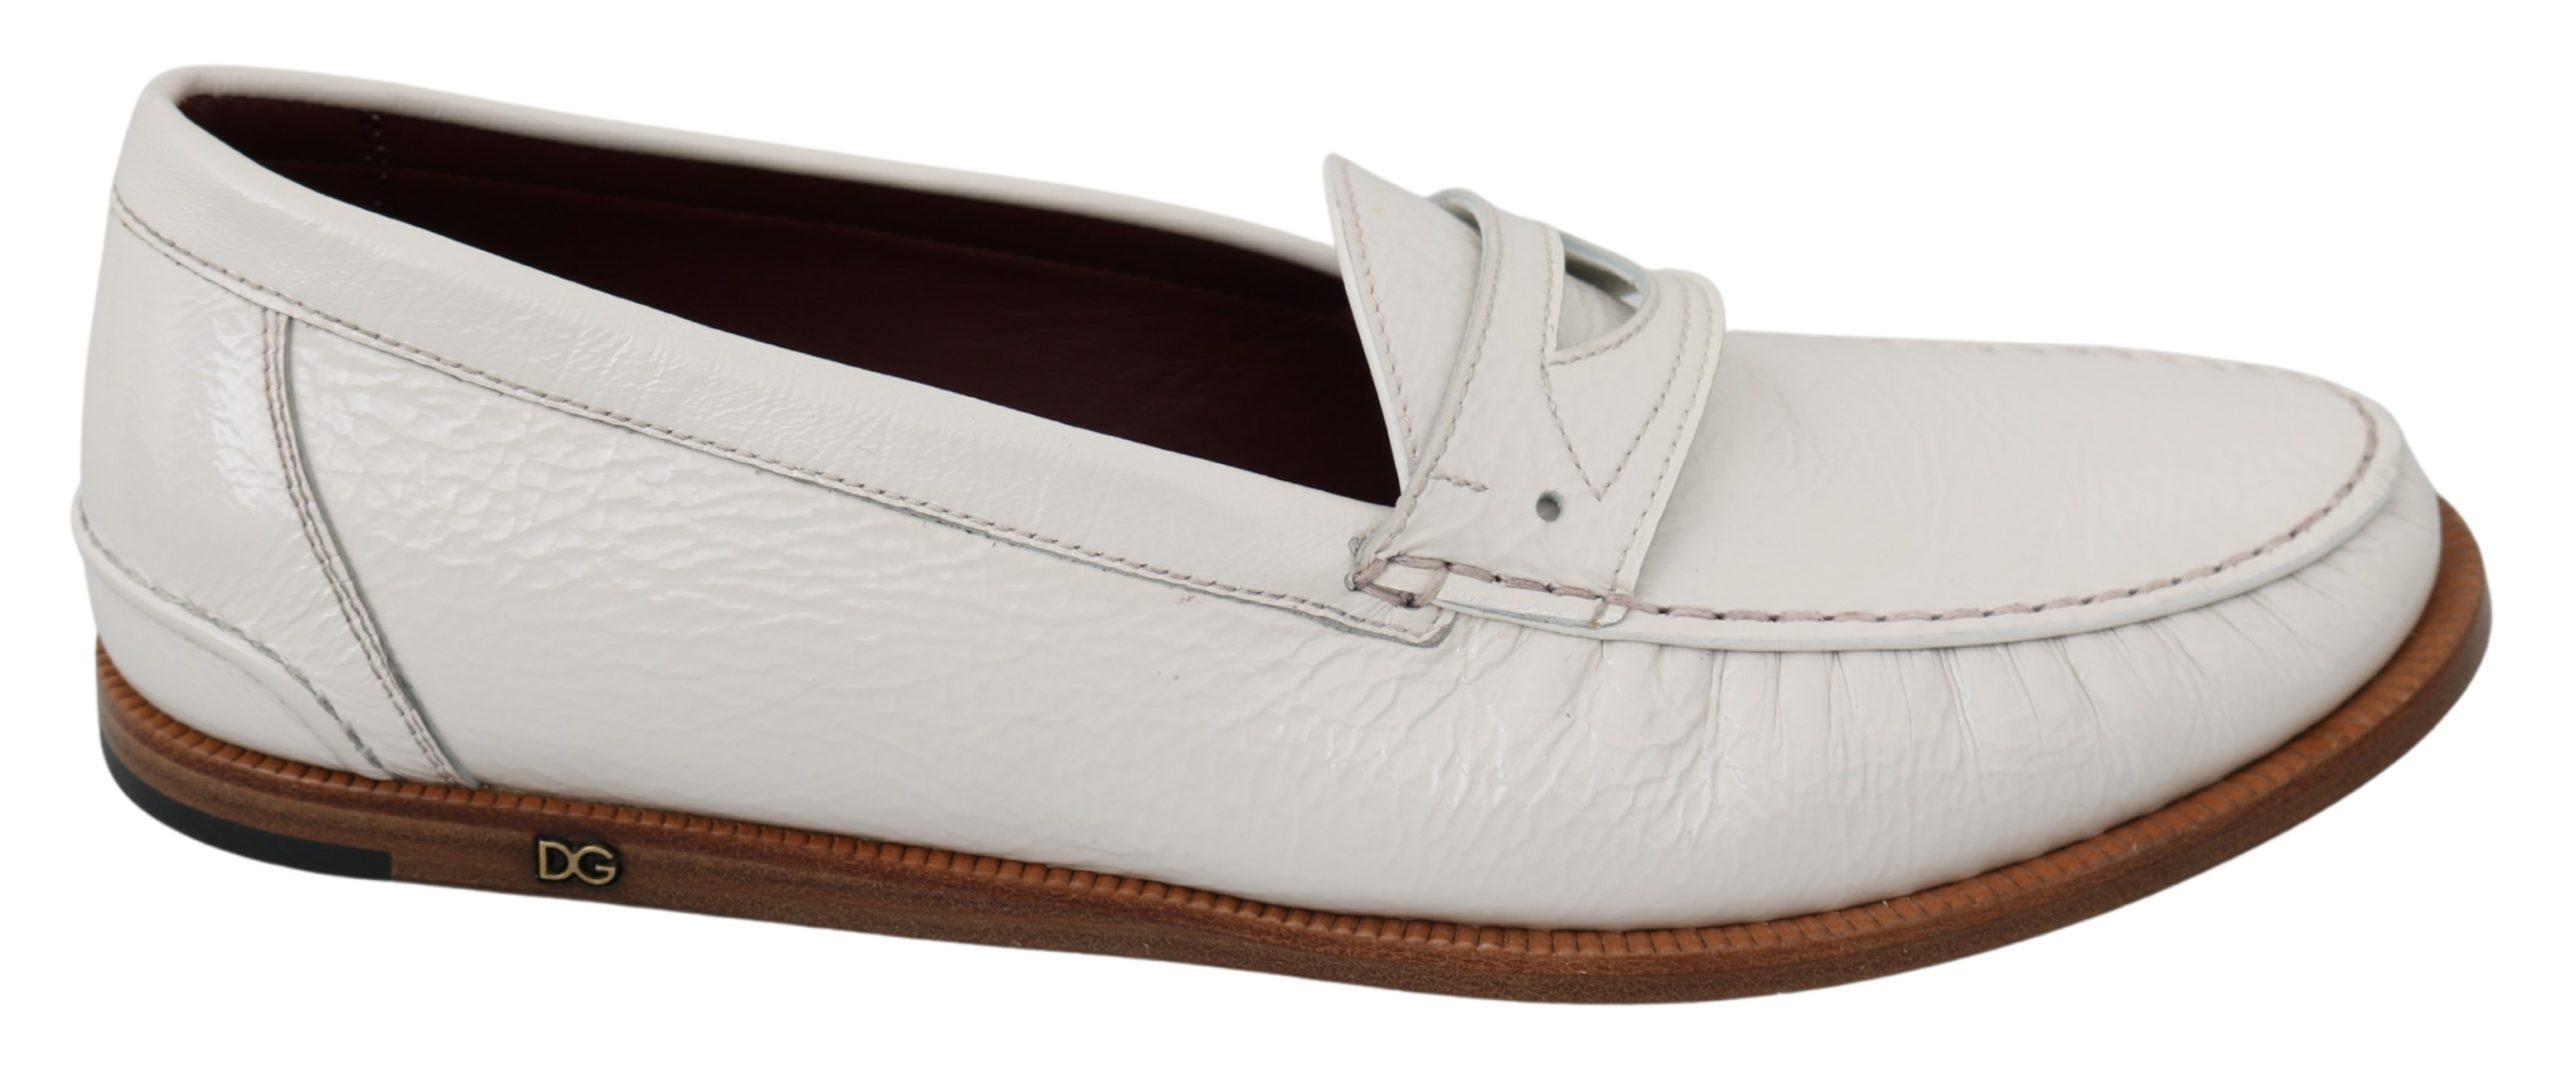 Dolce & Gabbana Men's Deer Skin Loafers White MV2875 - EU42/US9